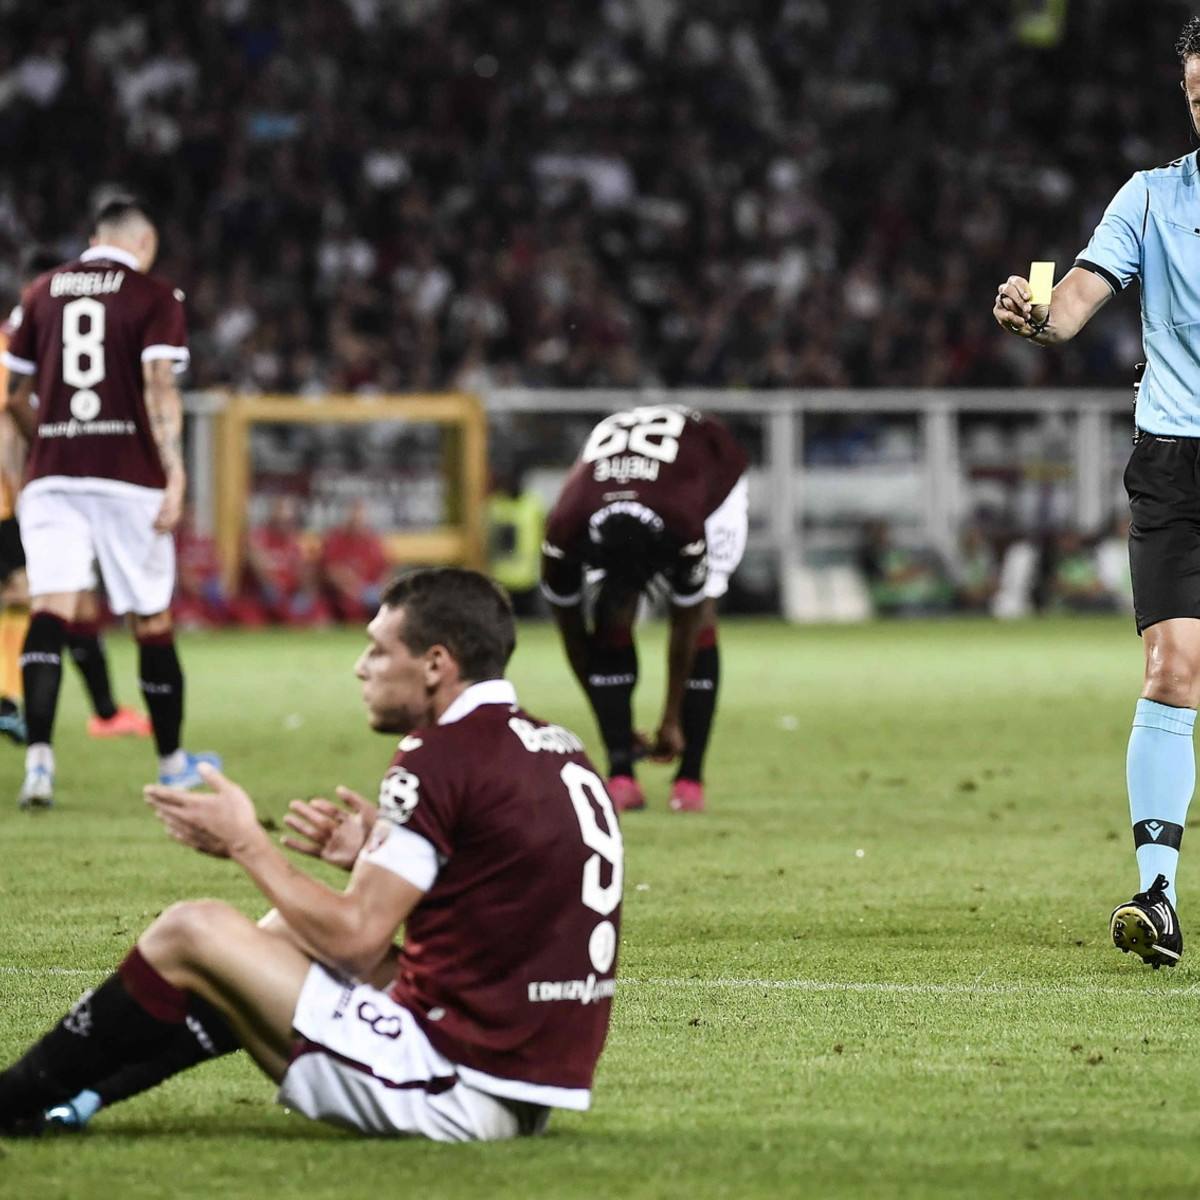 Europa League, Torino-Wolverhampton2-3: le foto del match